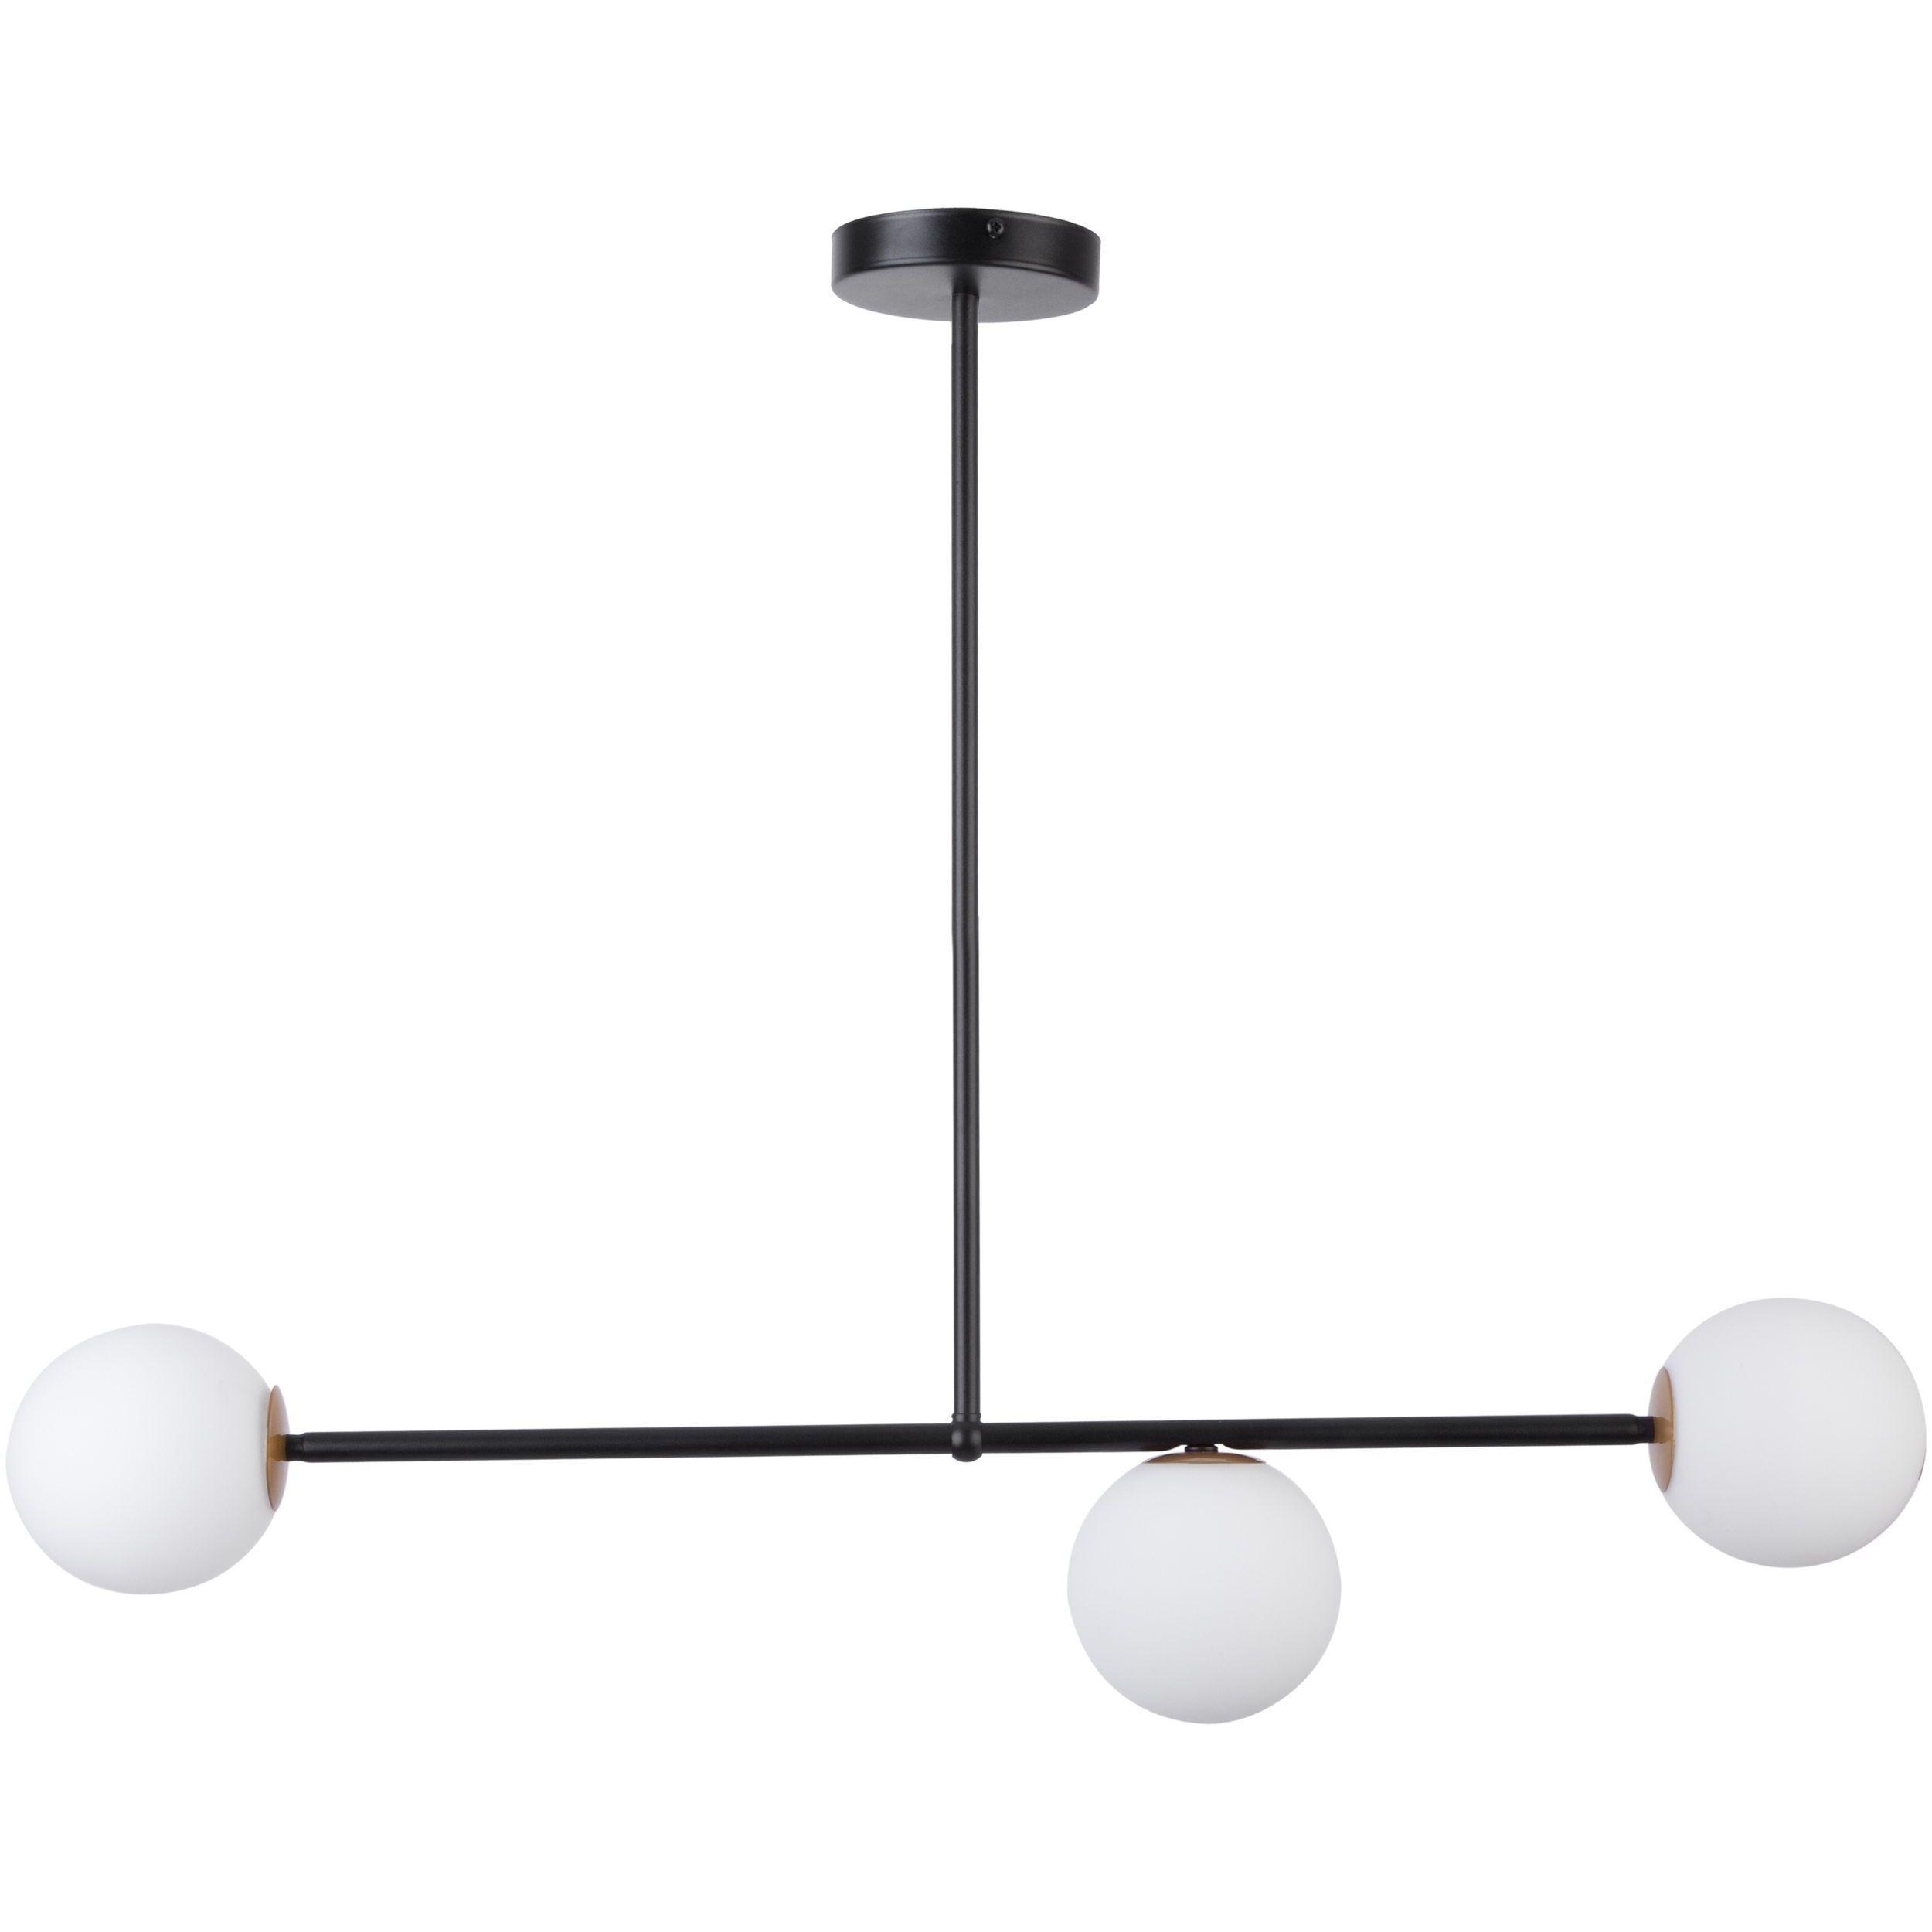 Lampa sufitowa Sigma Gama x3 Czarny